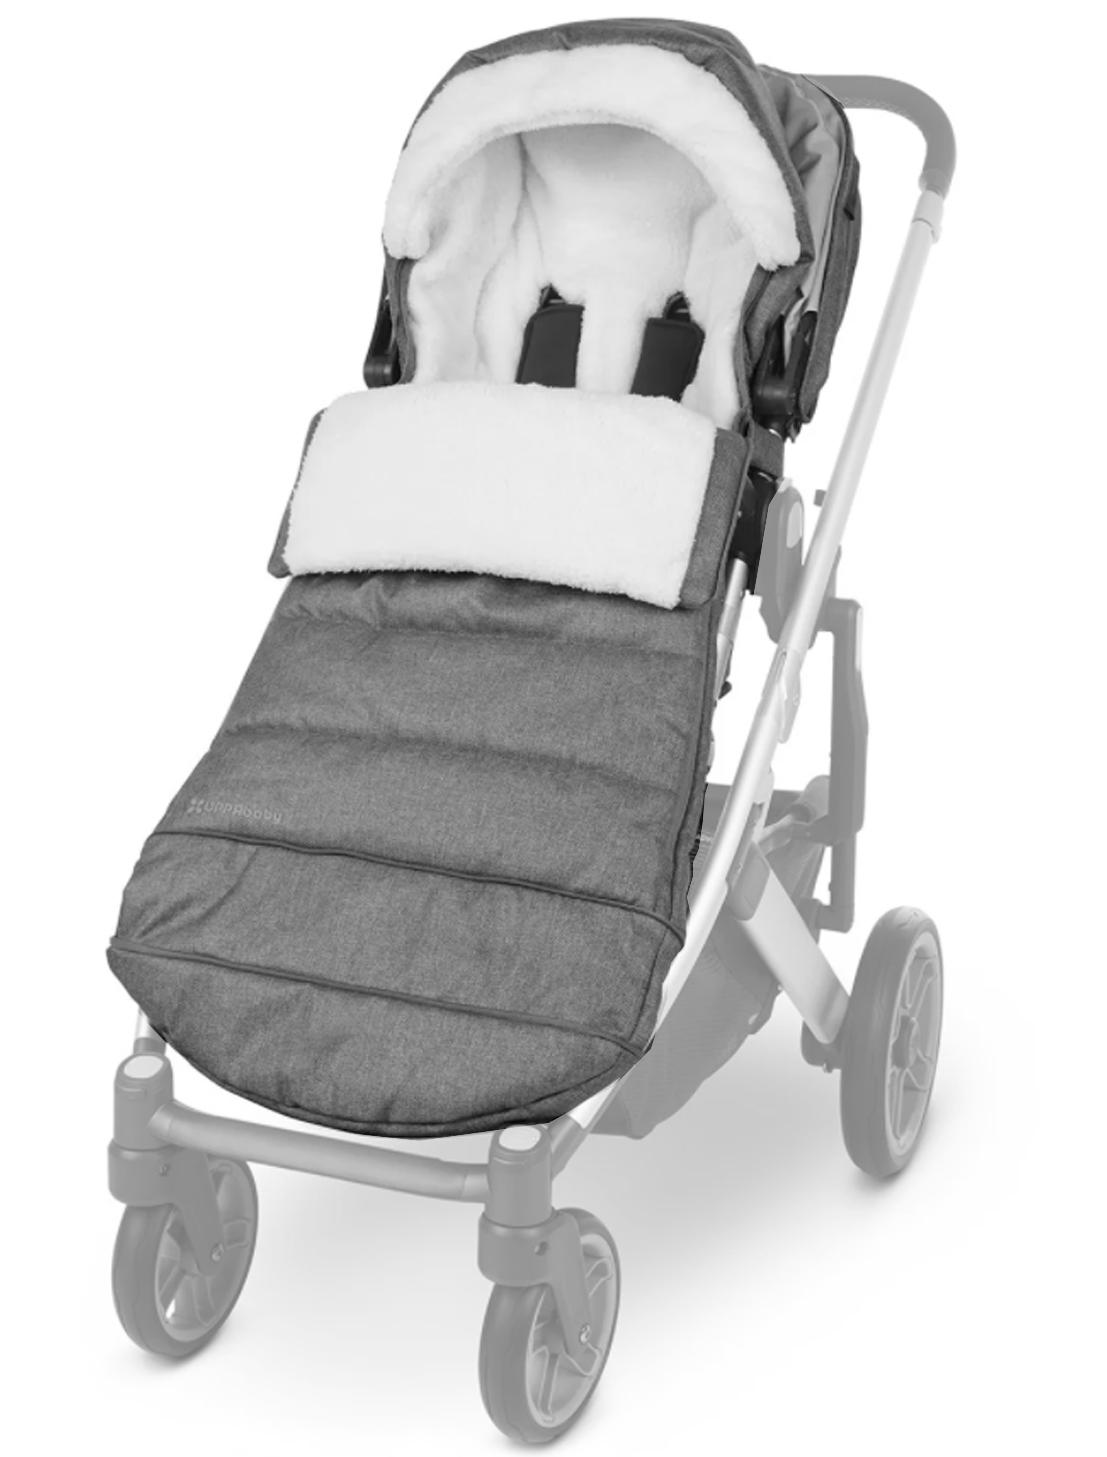 Купить 2267834, Аксессуар для коляски UPPAbaby, серый, 3984528080102